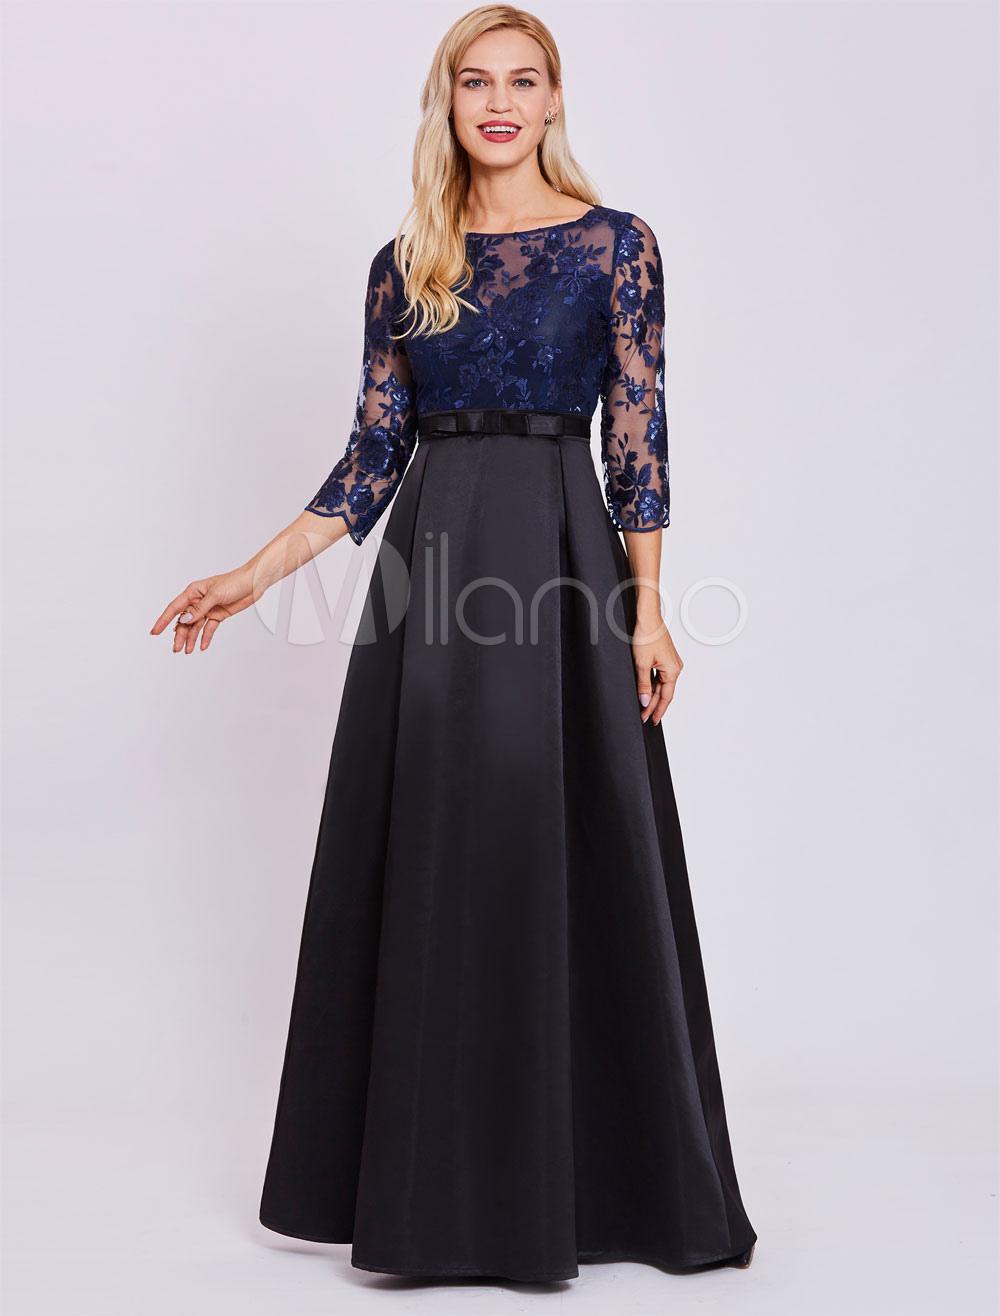 f3917e6fb28 ... Evening Dresses Dark Navy Lace Satin Long Sleeve Illusion Bow Sash Floor  Length Formal Dress-. 12. 32%OFF. Color Dark Navy